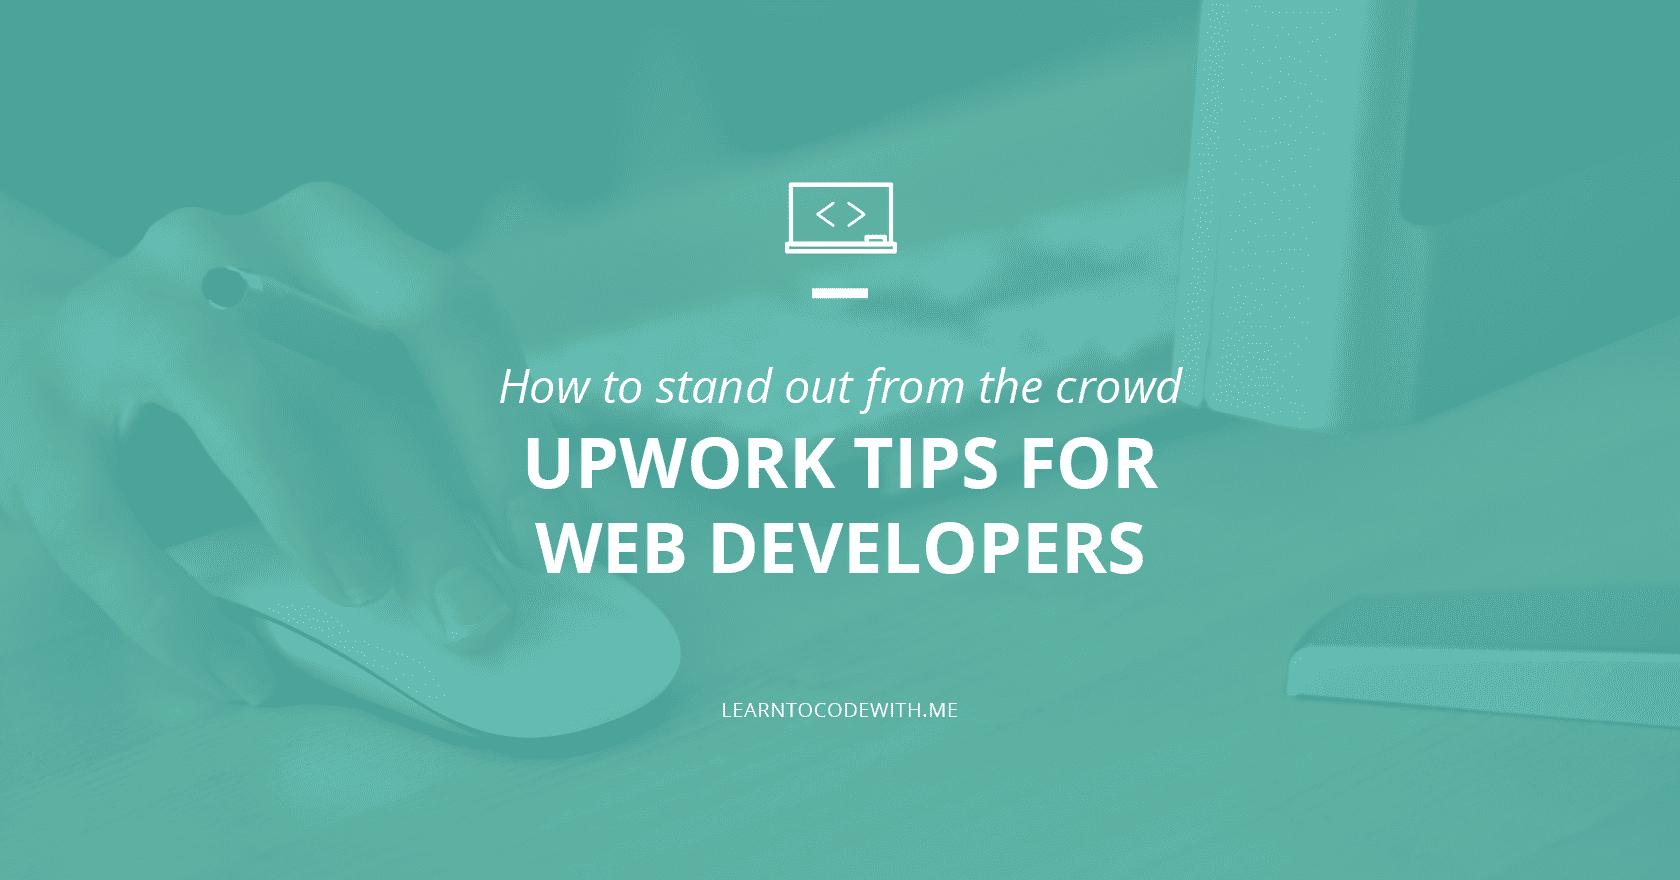 Upwork tips for web developers